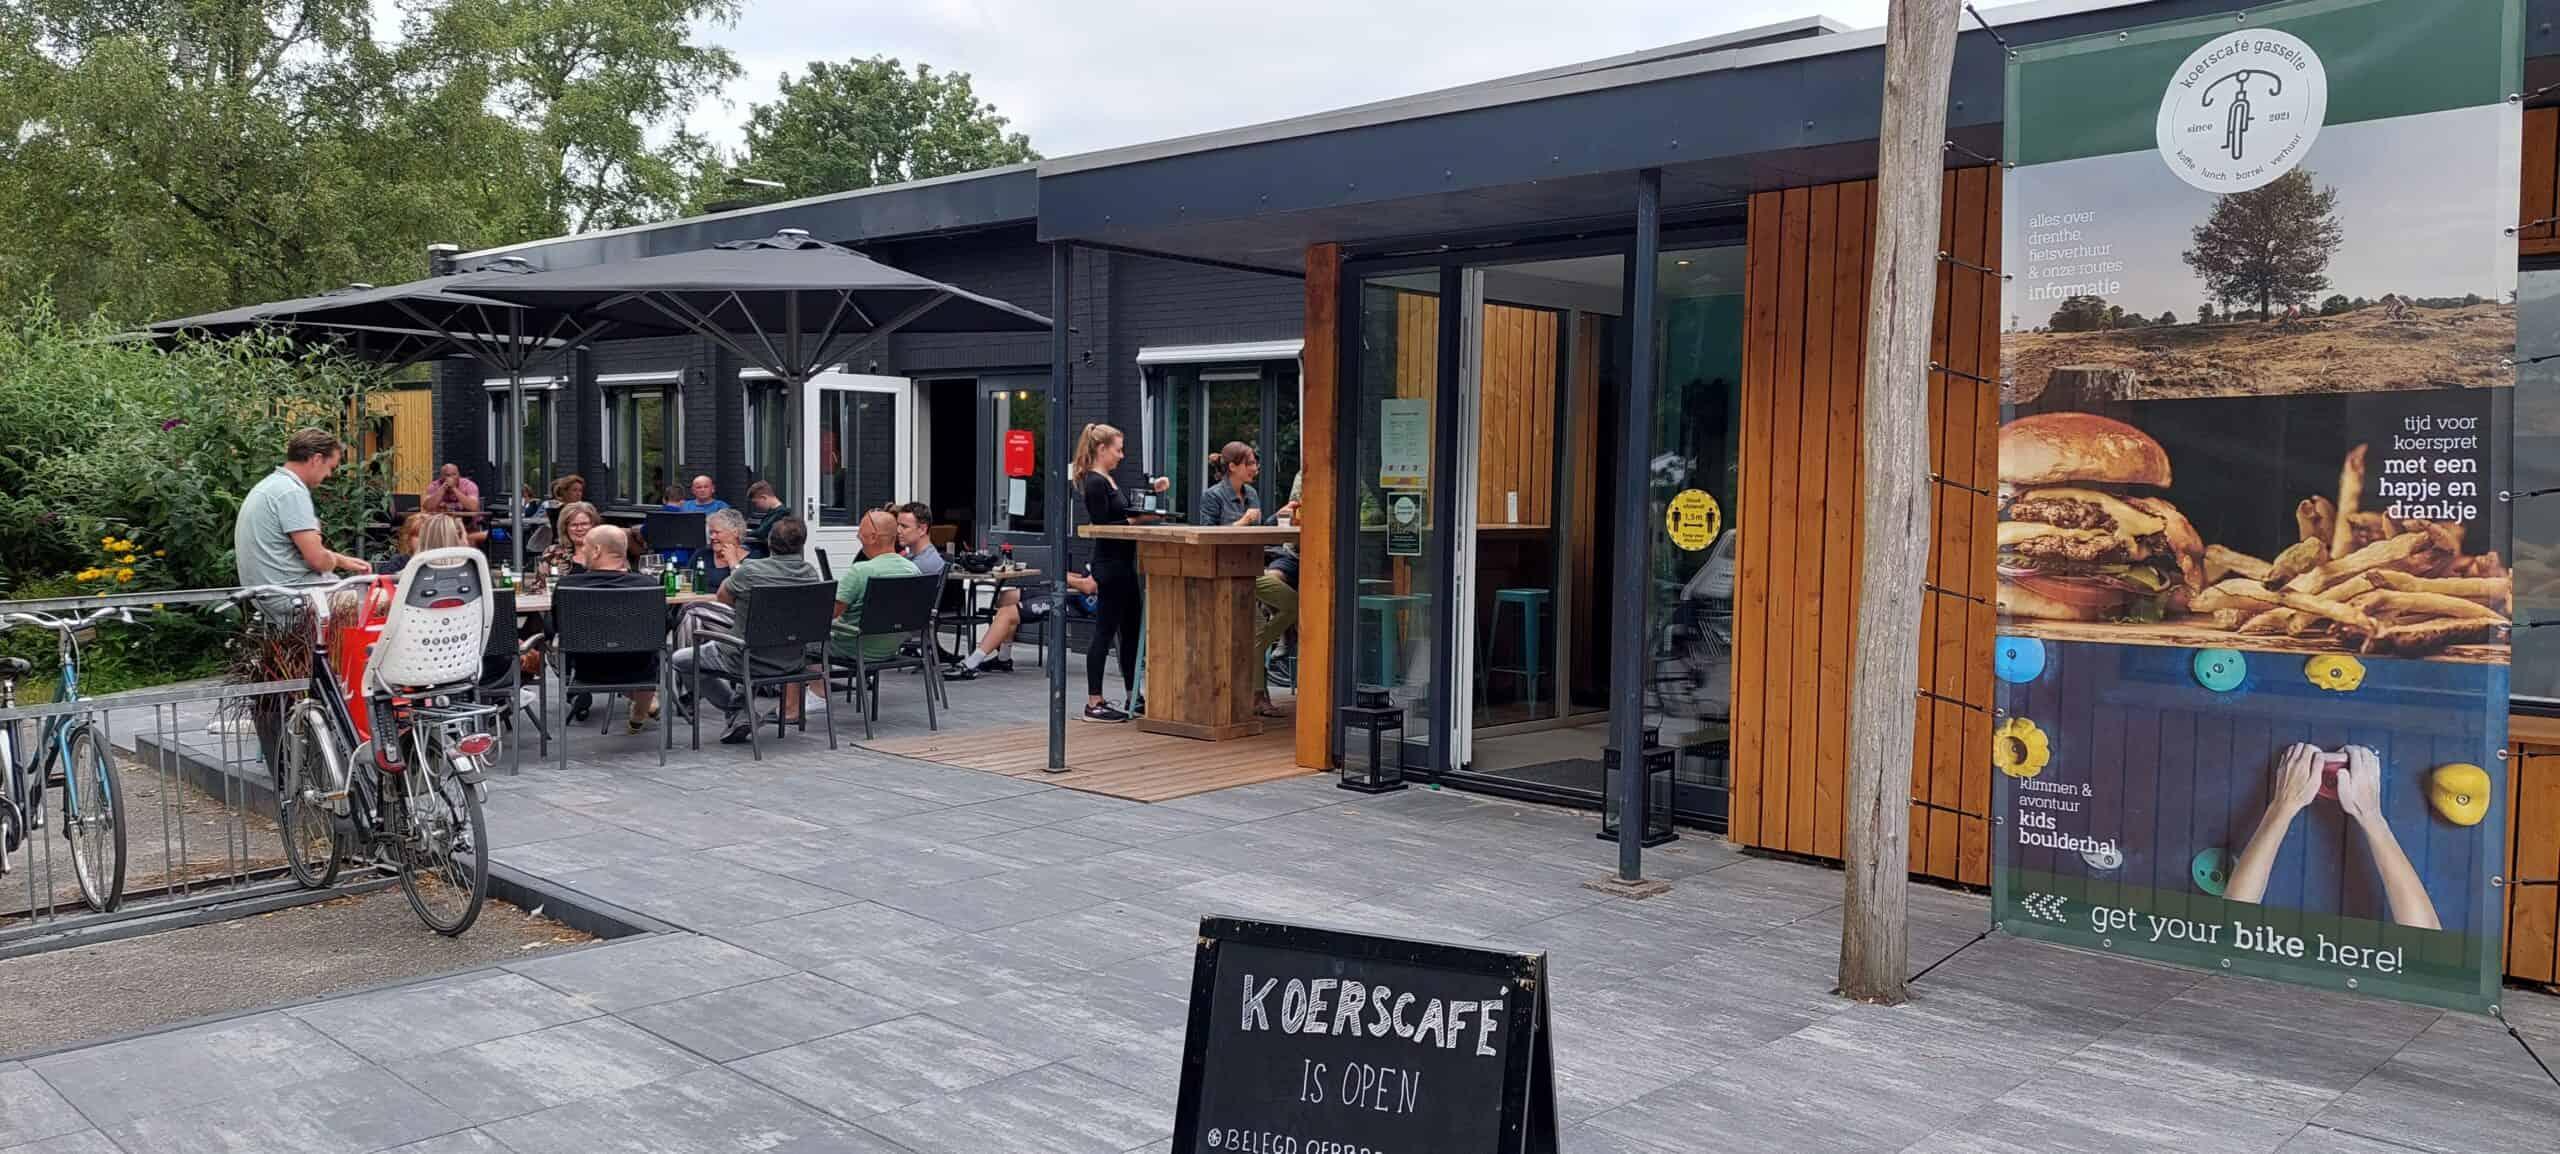 Koerscafé Gasselte - wielercafes.nl